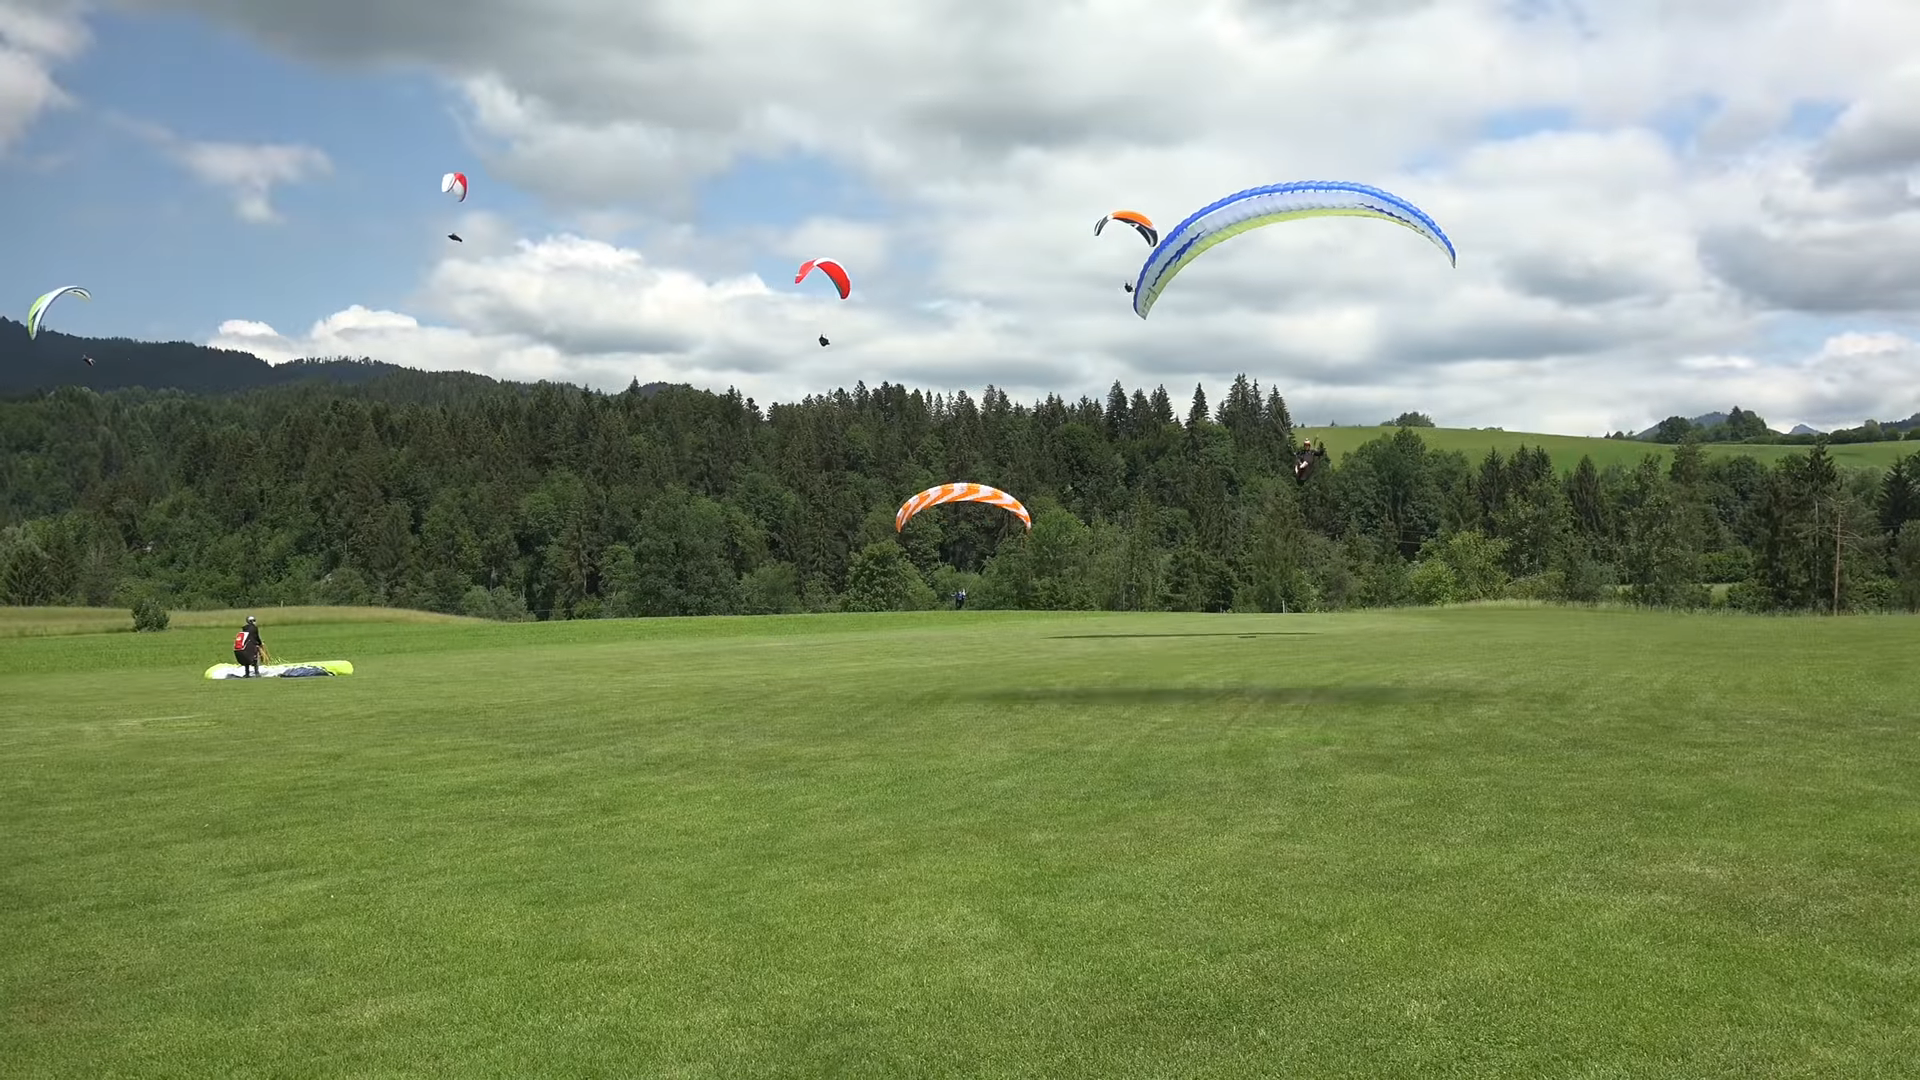 Kössen Super Paragliding Testival 2018